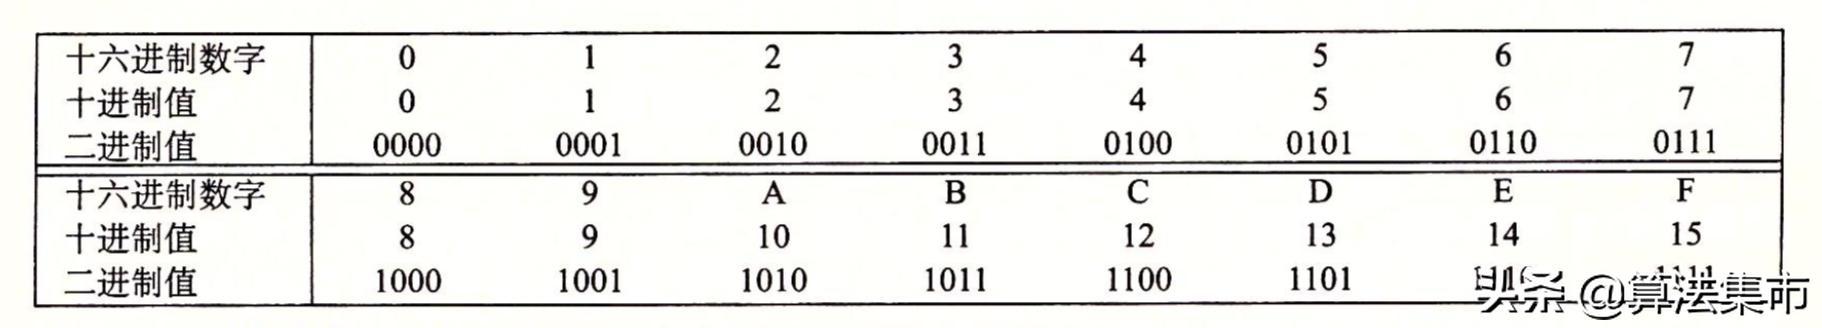 5eb468758daac8eeb9e96ed7fd5f6c43.png